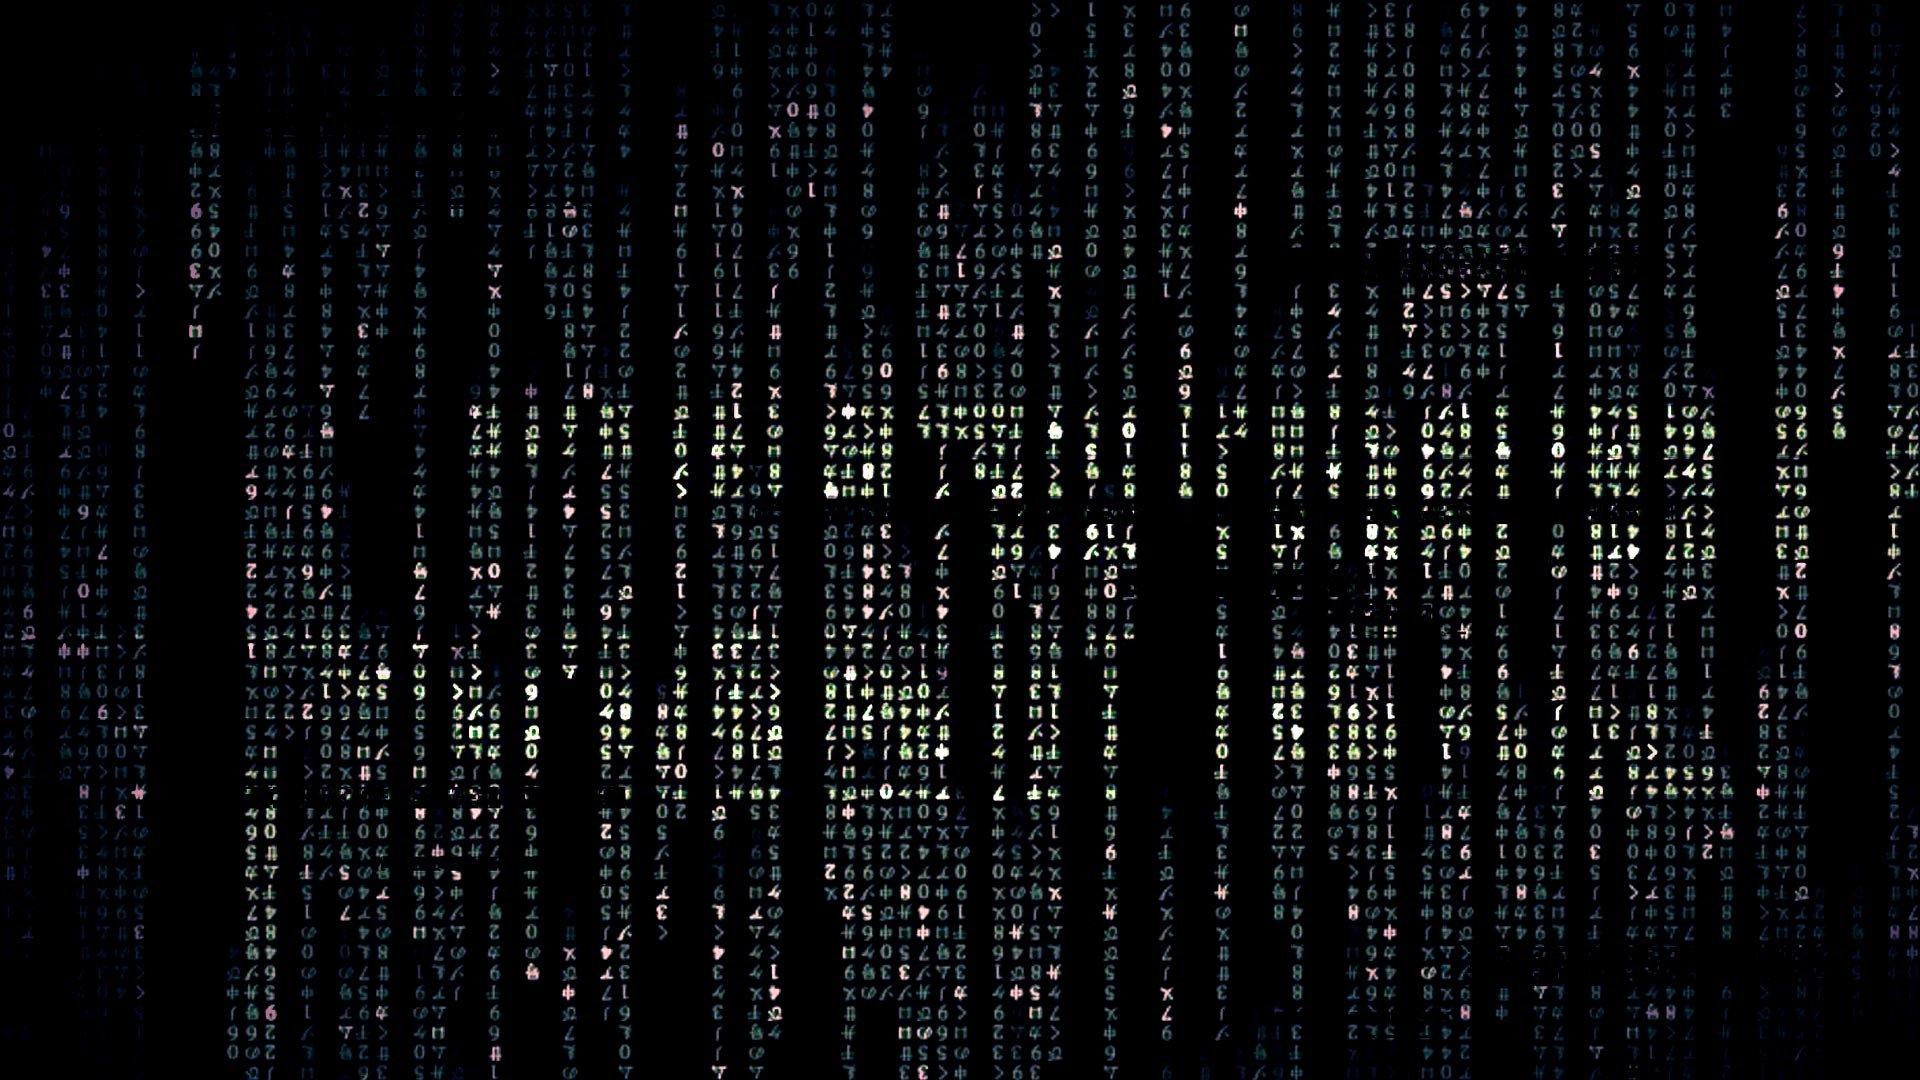 hacker wallpaper 1920x1080 - photo #14